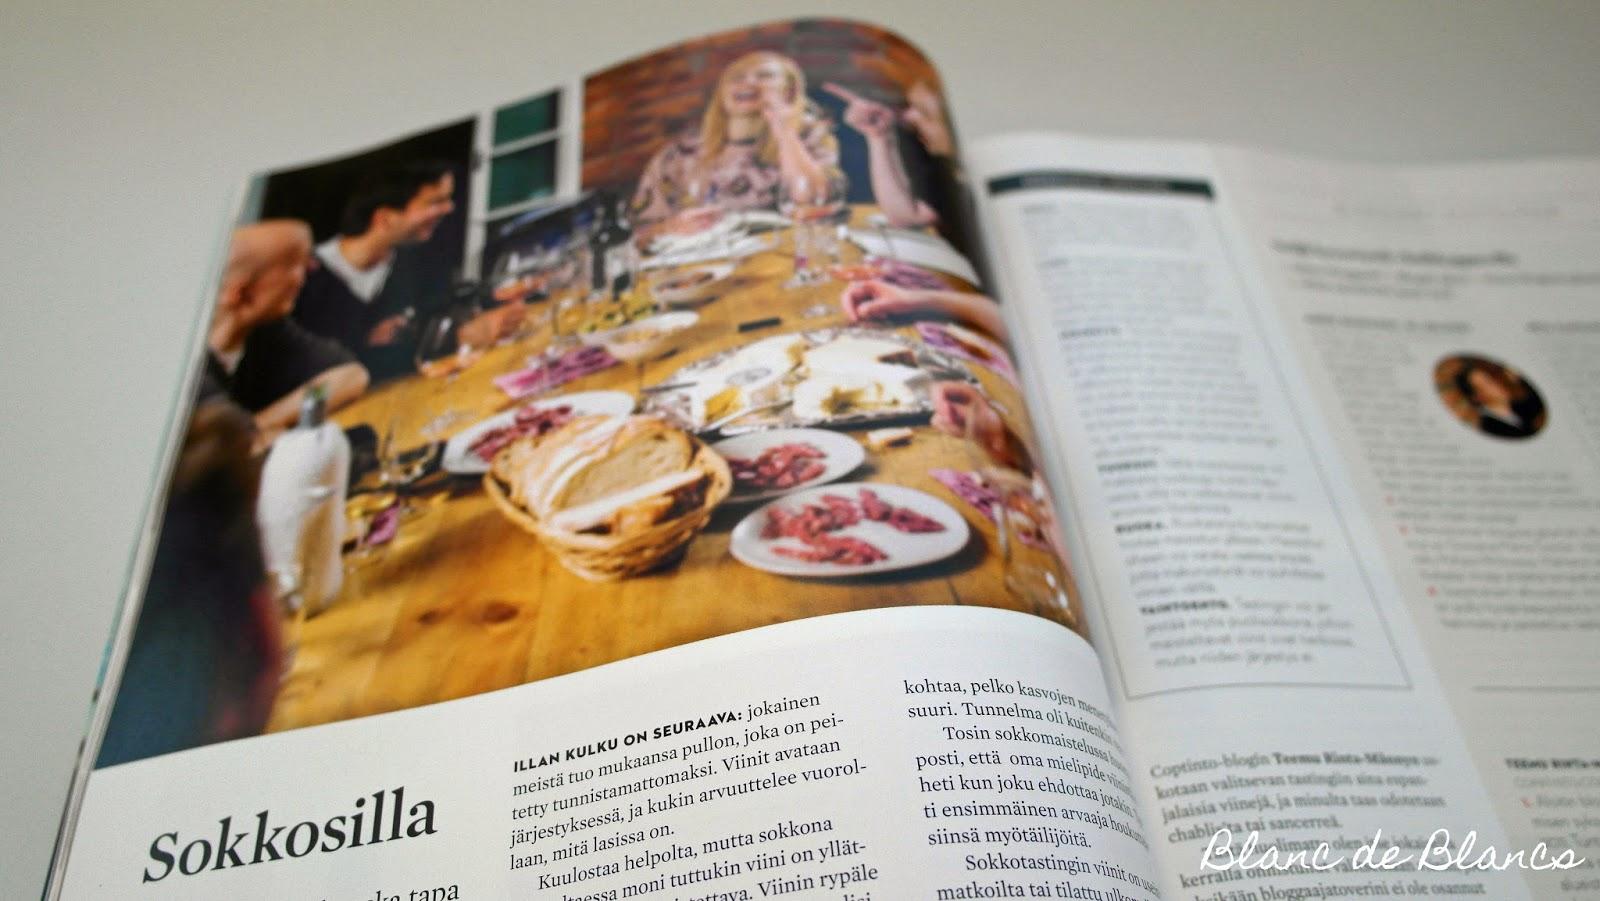 Sokkosilla-artikkeli Viini-lehti - www.blancdeblancs.fi